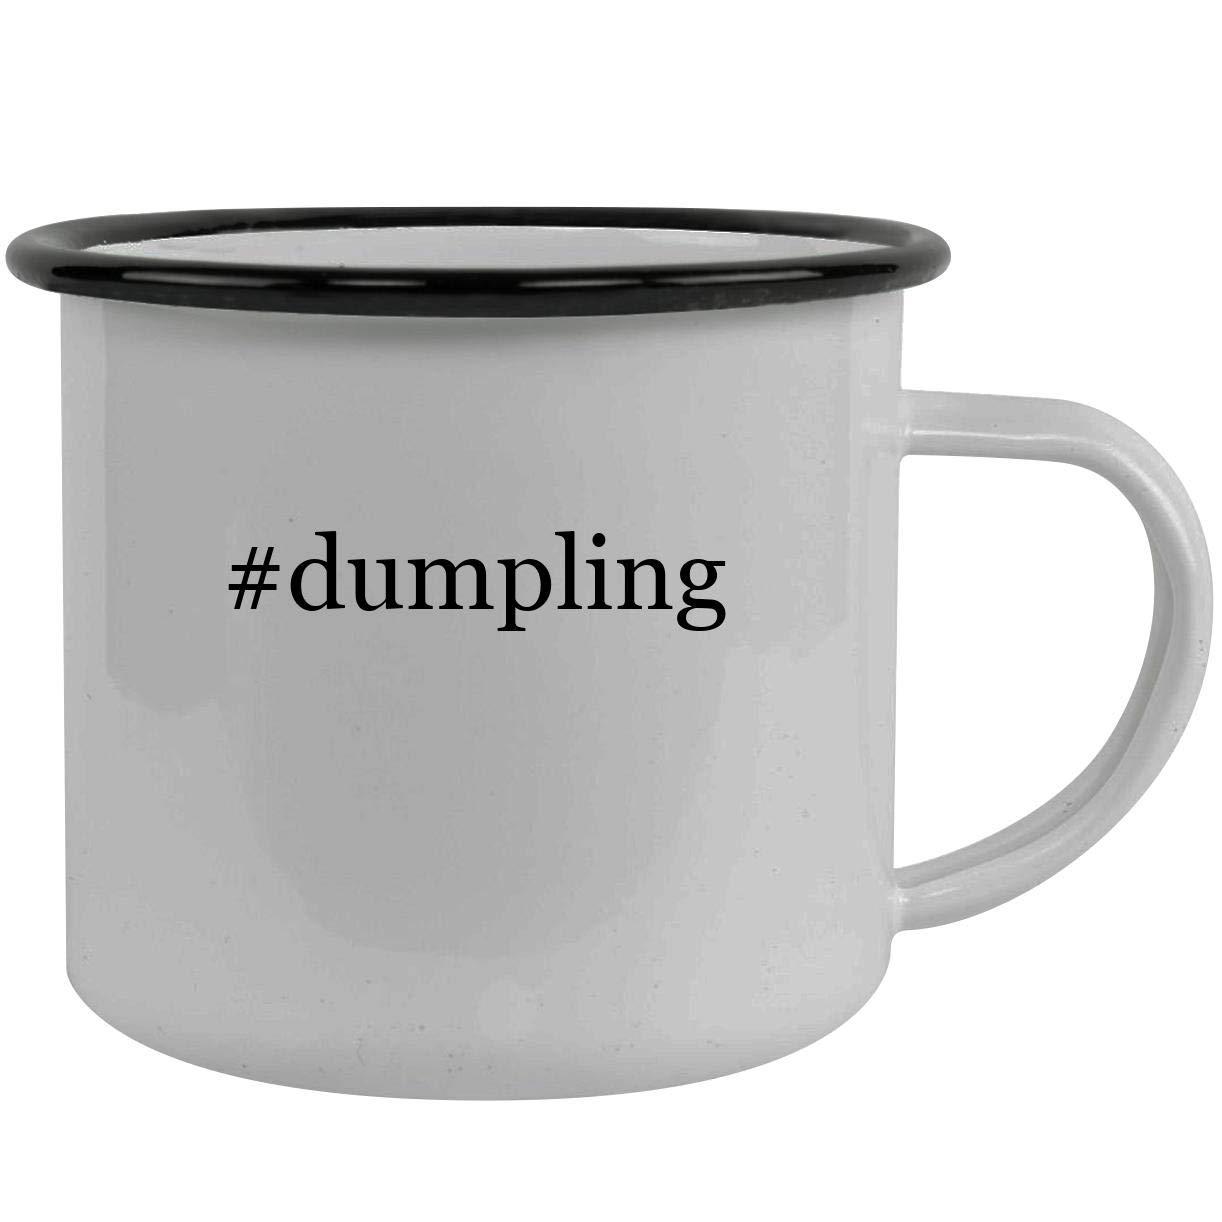 #dumpling - Stainless Steel Hashtag 12oz Camping Mug